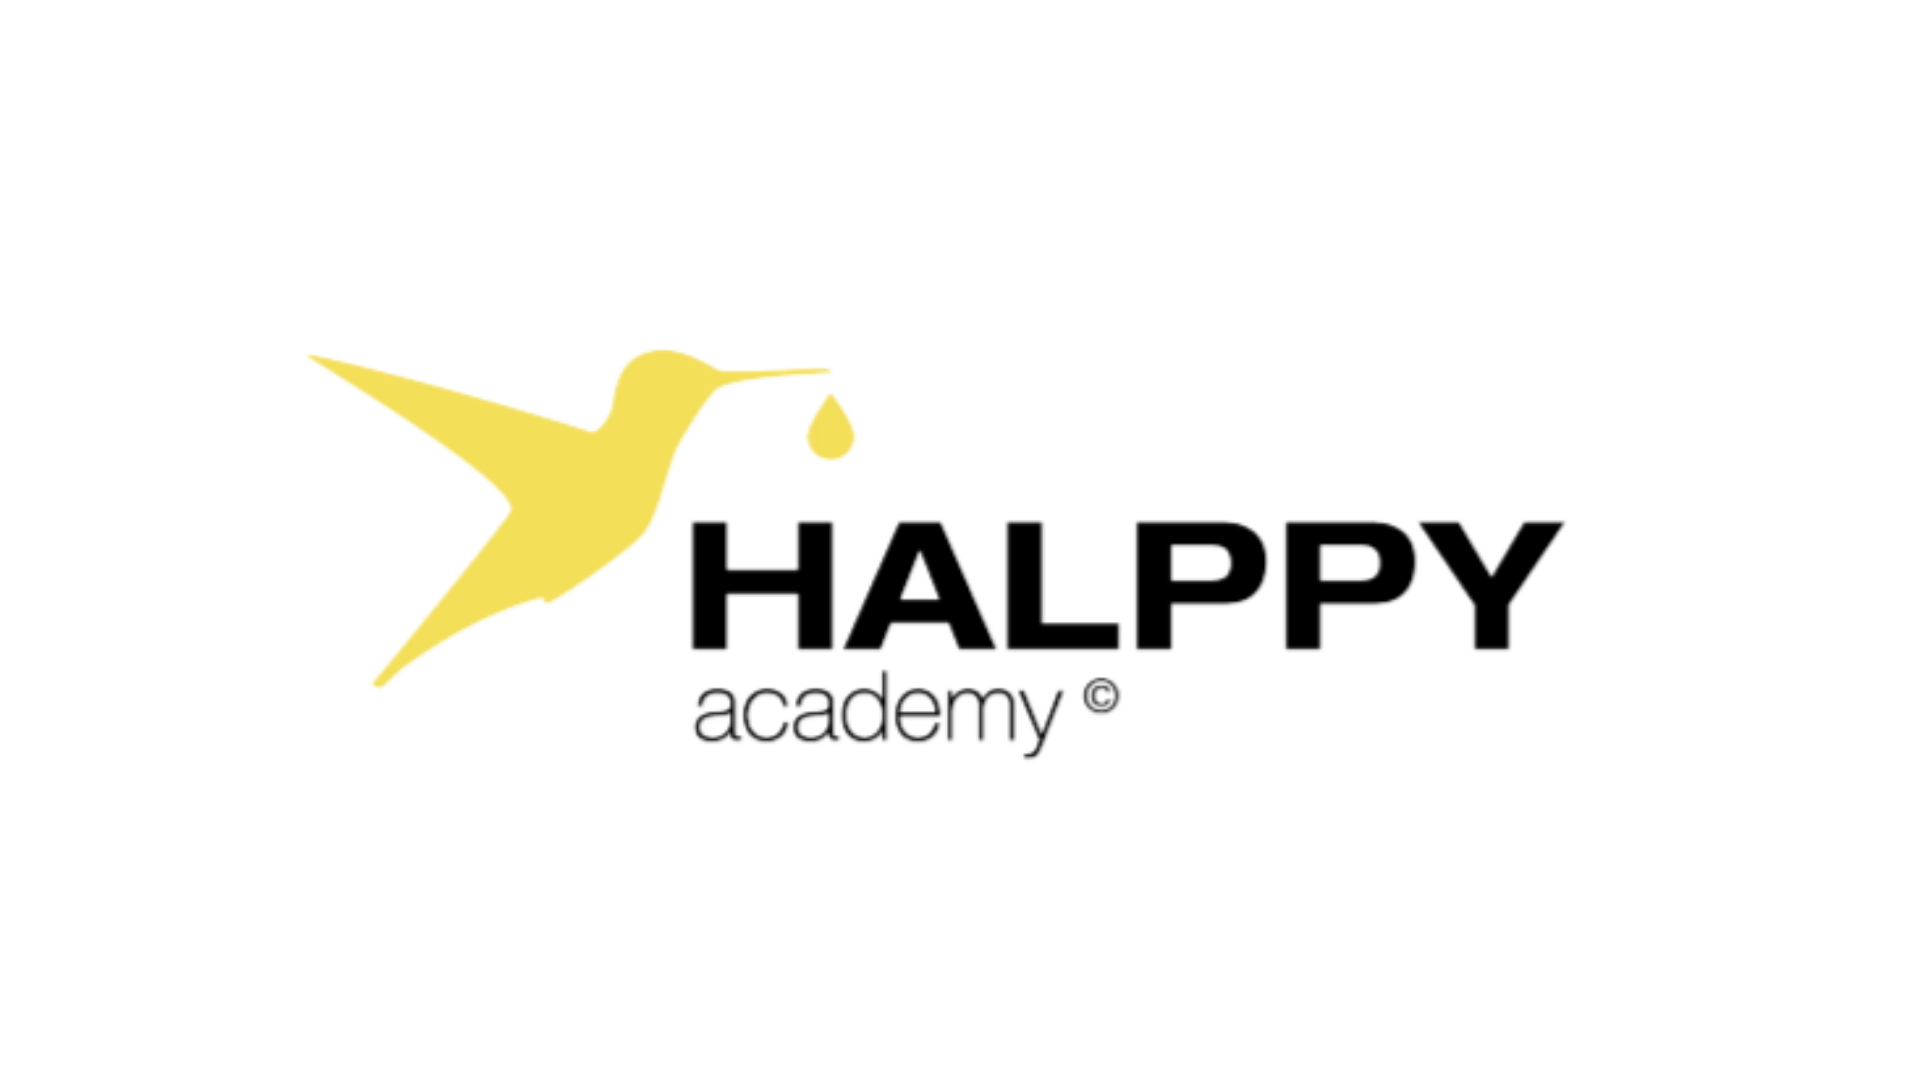 Logo Halppy academy